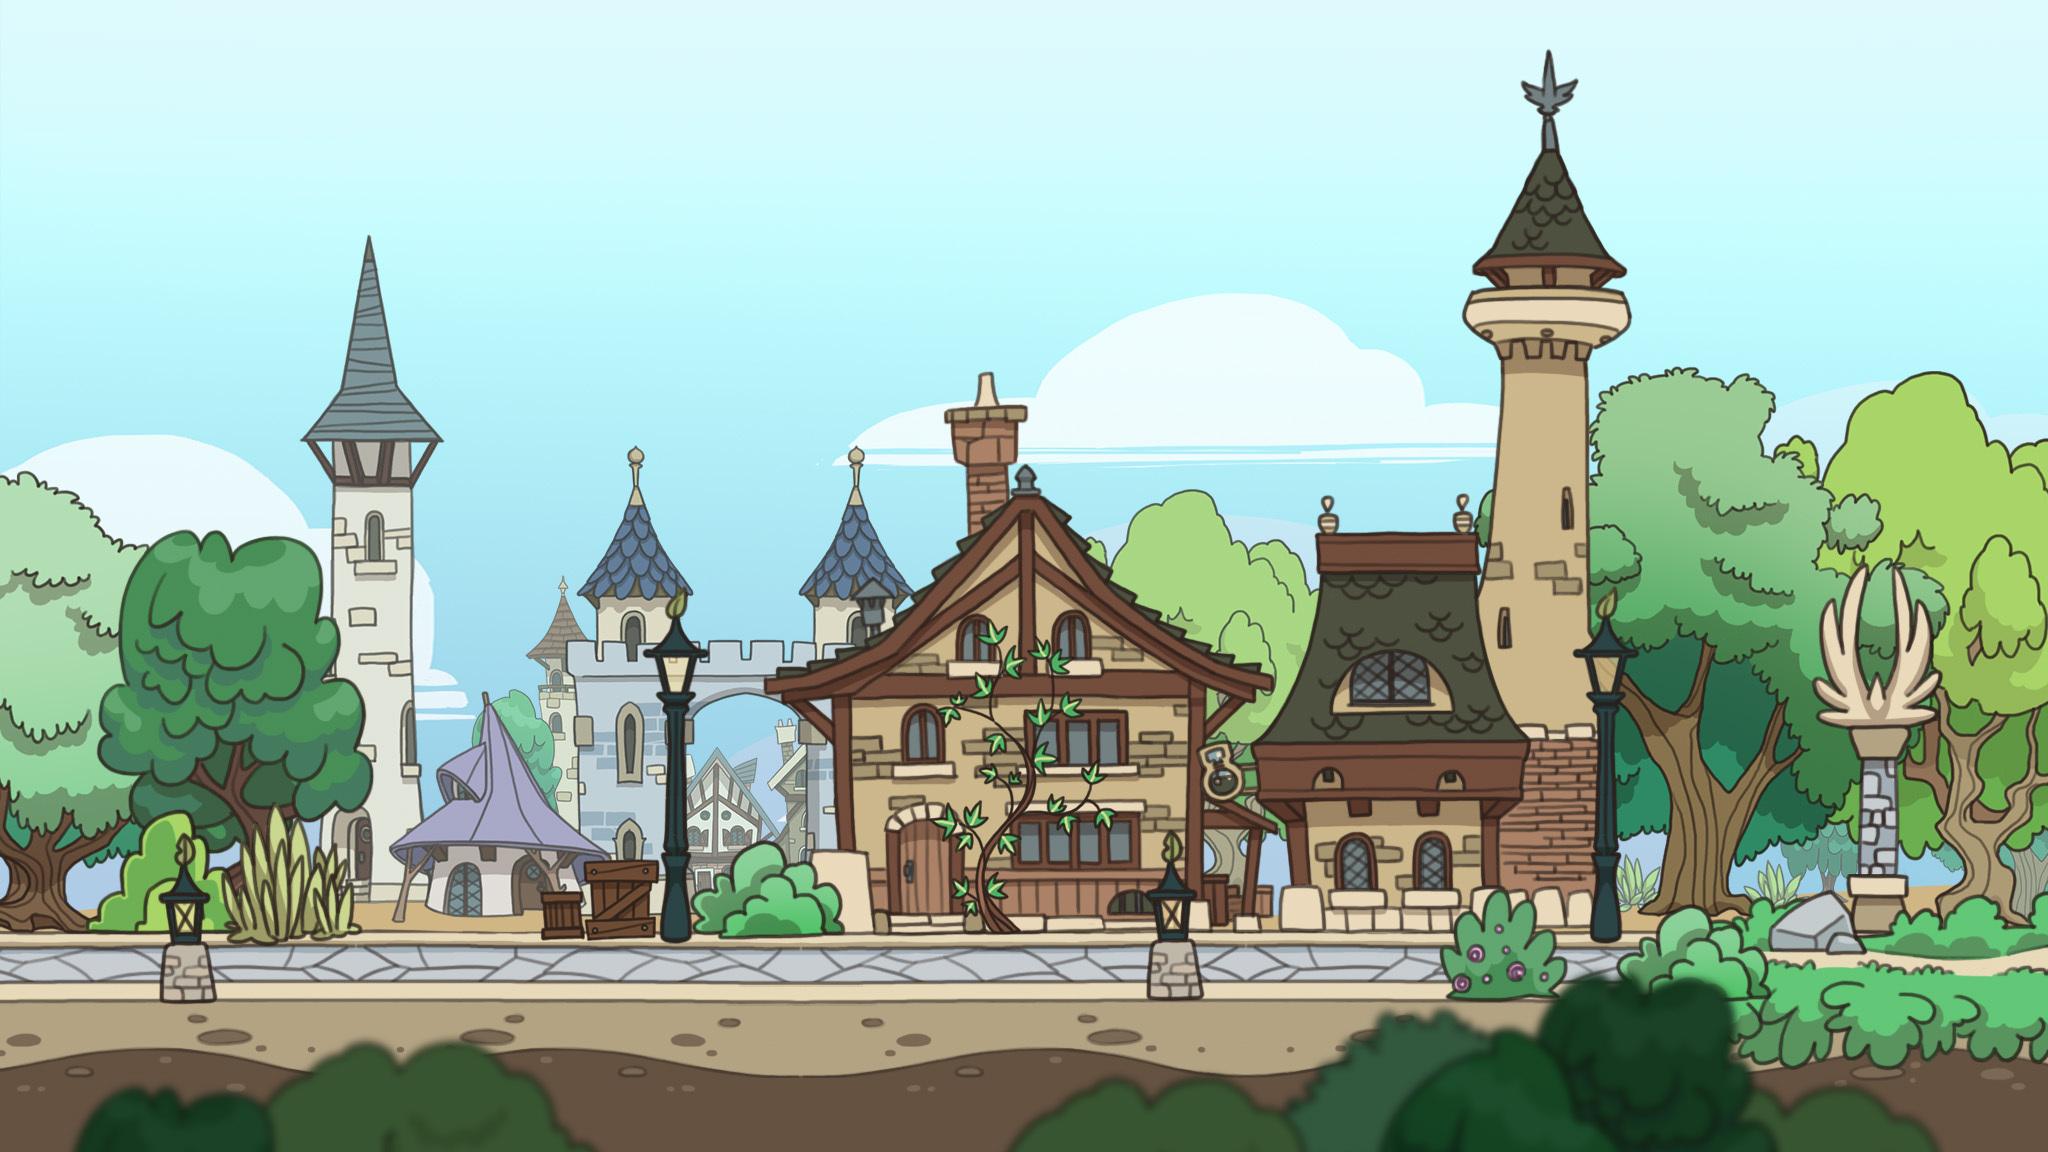 Tiny Town (part 1)